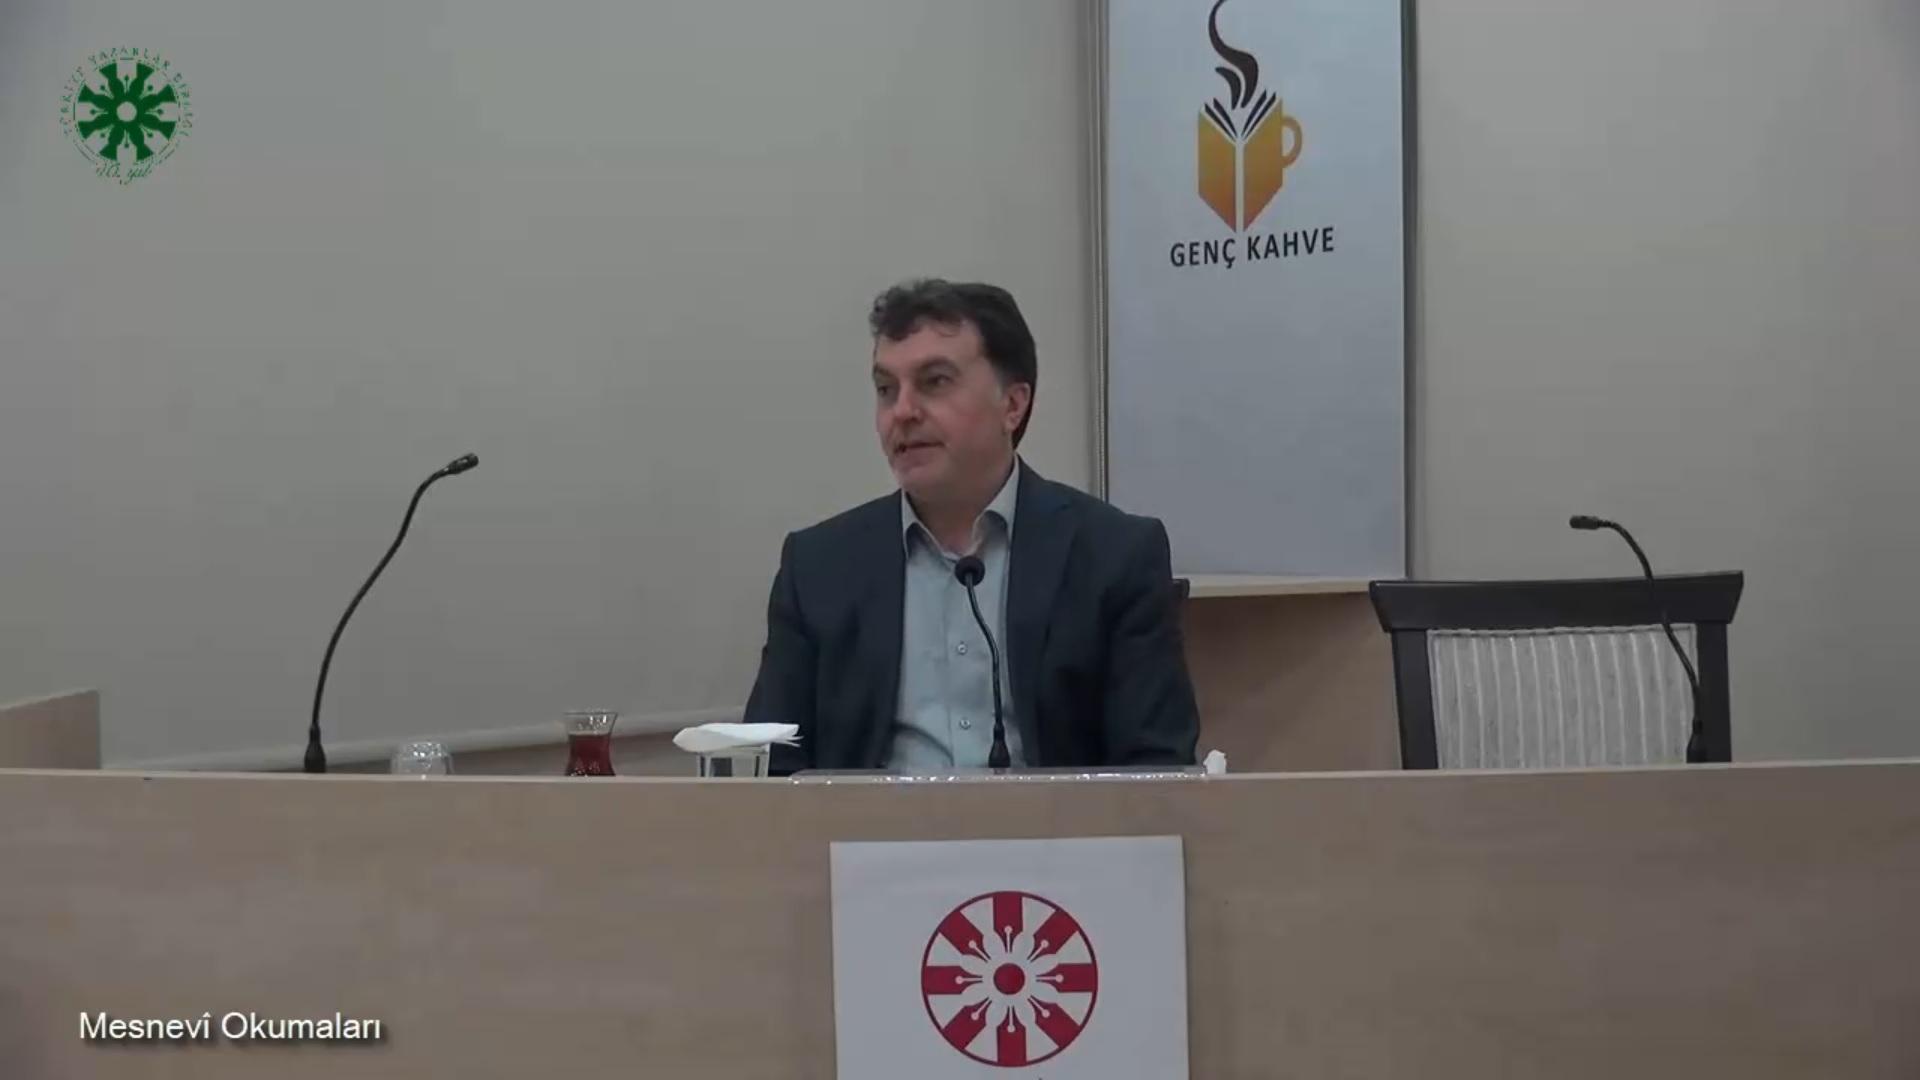 Mesnevî Okumaları - 21 - Prof. Dr. Hicabi Kırlangıç (video)